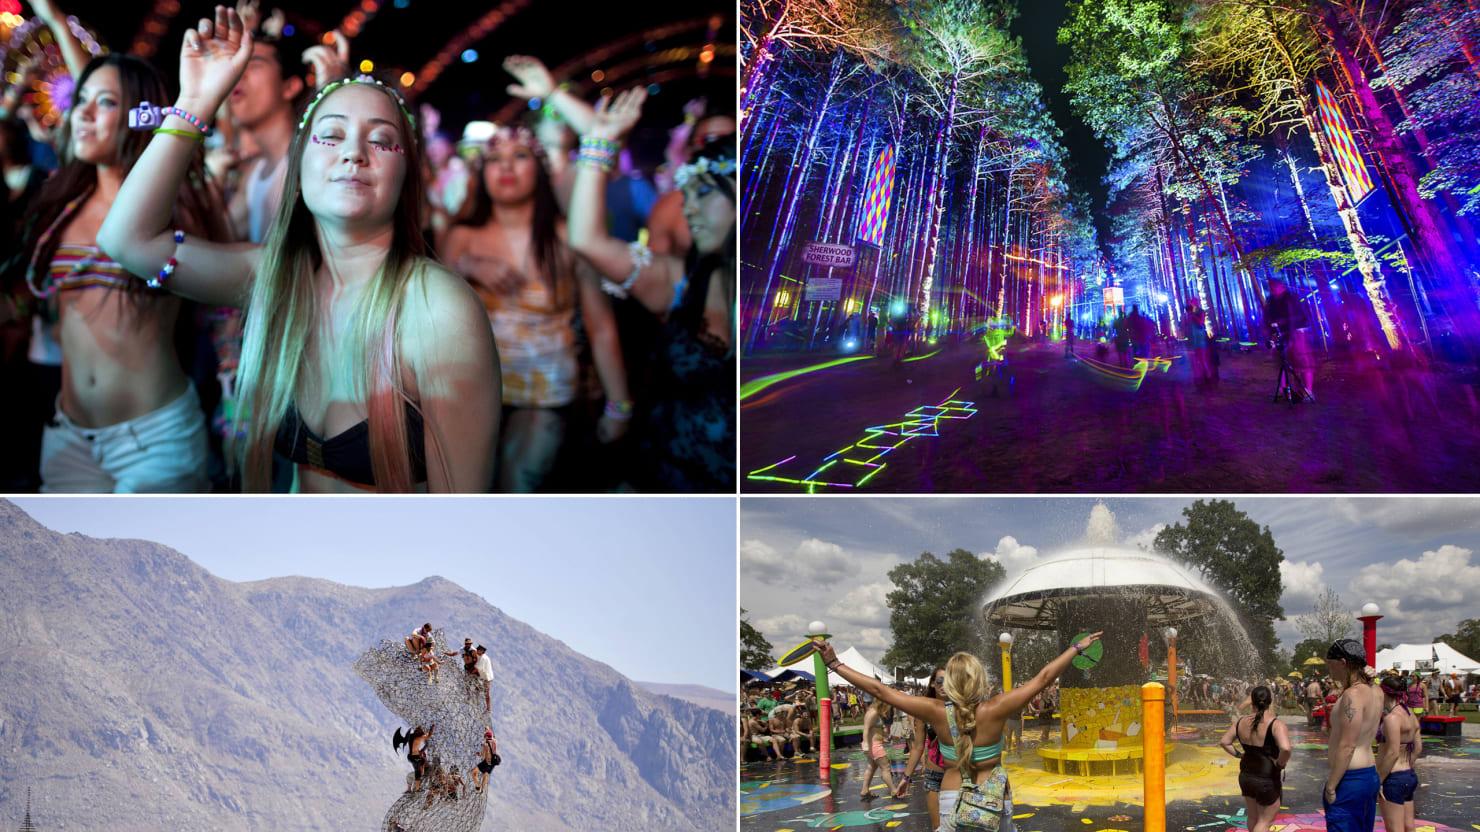 18 Best U.S. Summer Music Festivals: From Bonnaroo to EDC (PHOTOS)